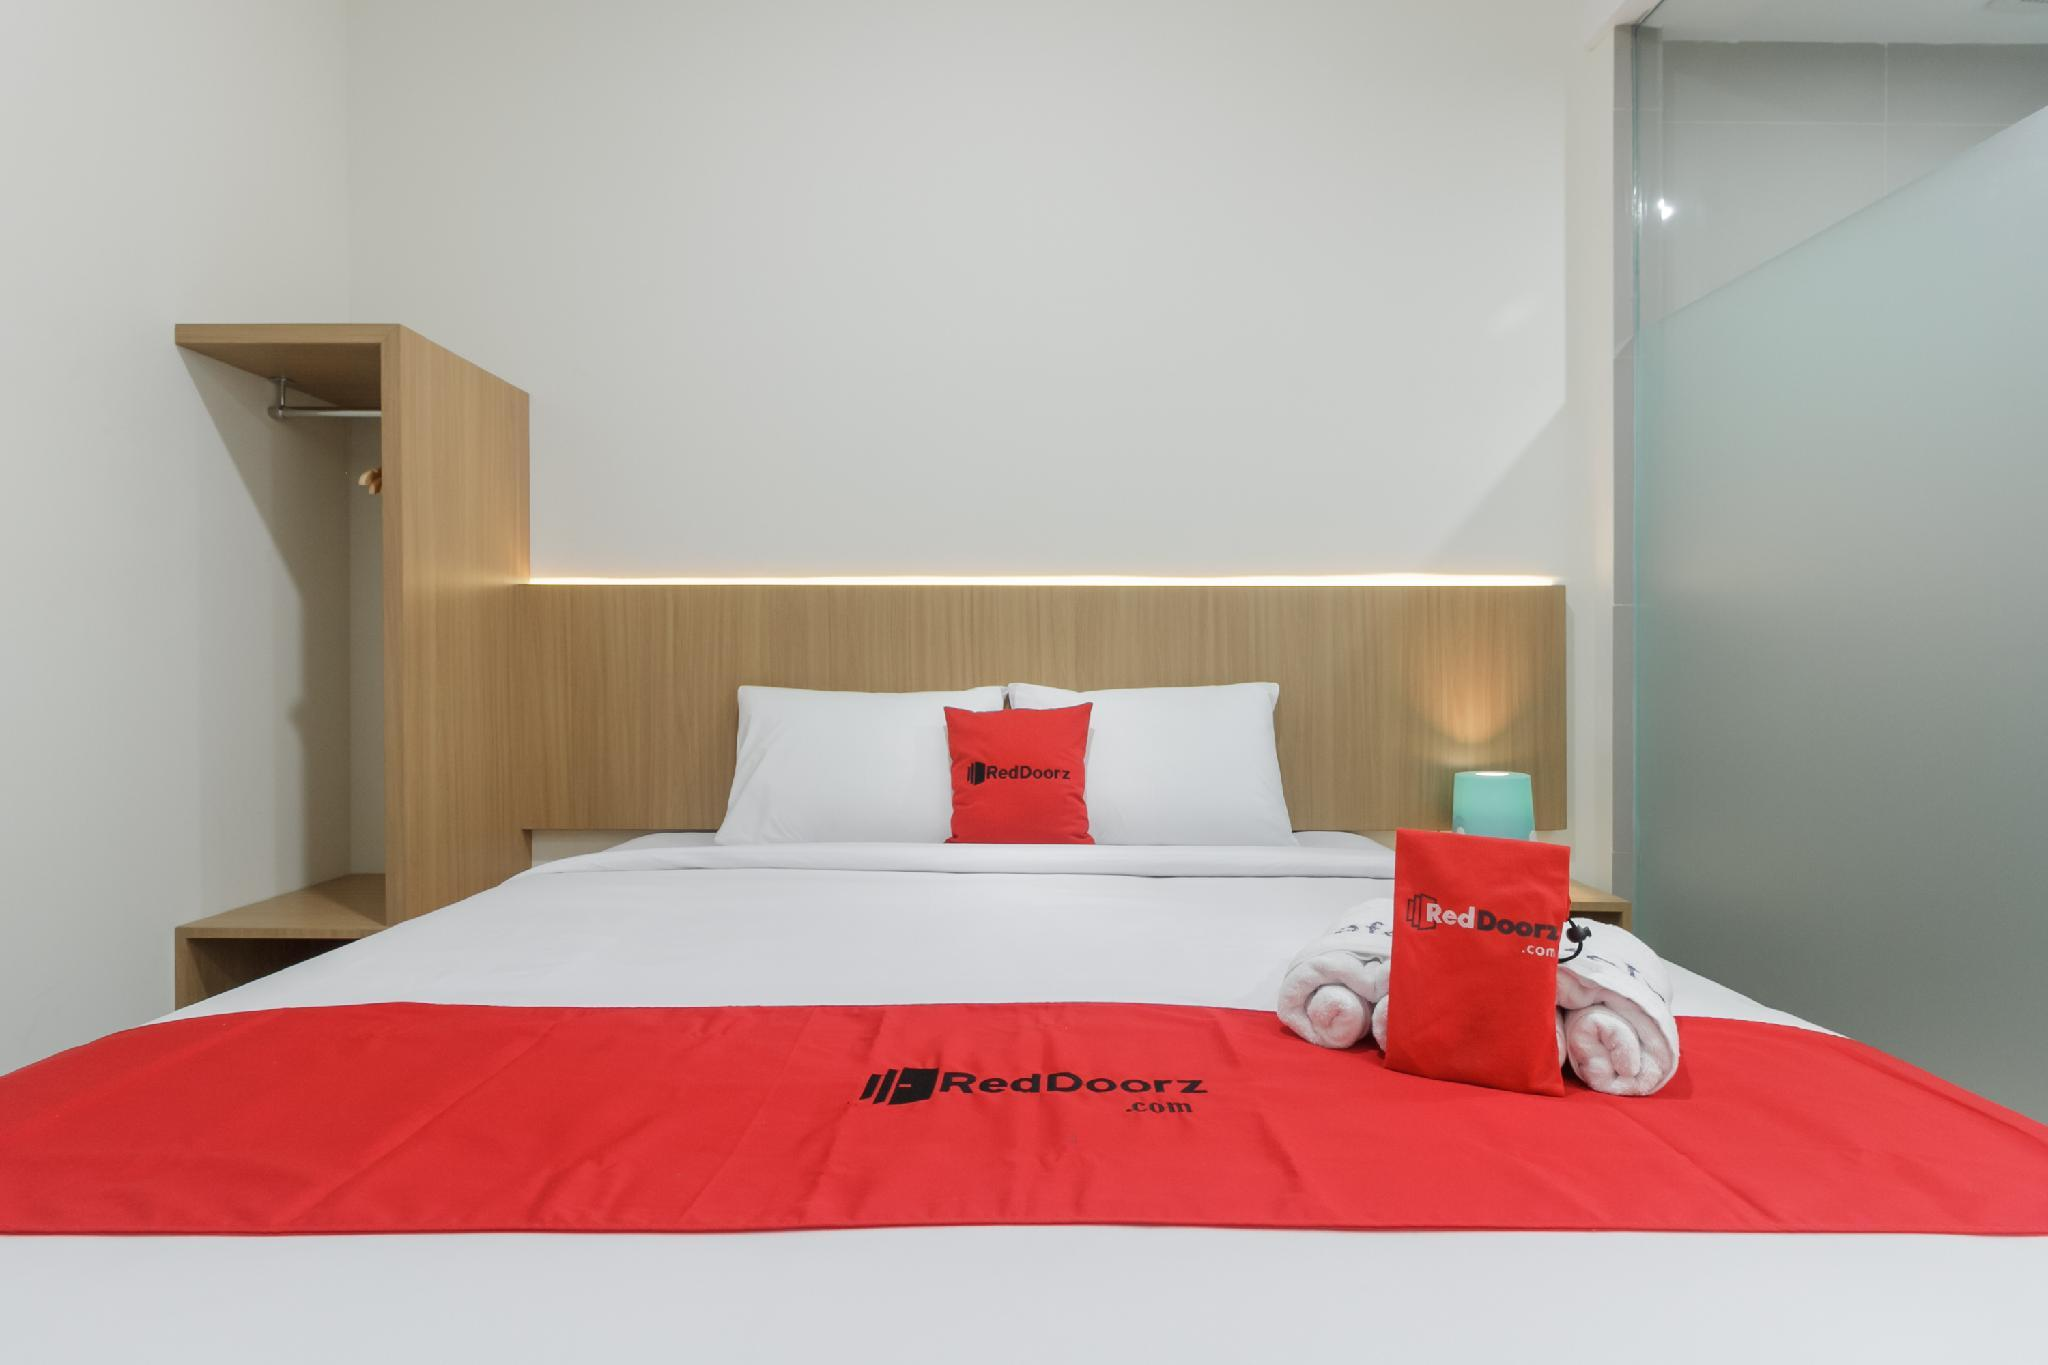 Reddoorz Near Mall Ska Pekanbaru Indonesia 2019 Reviews